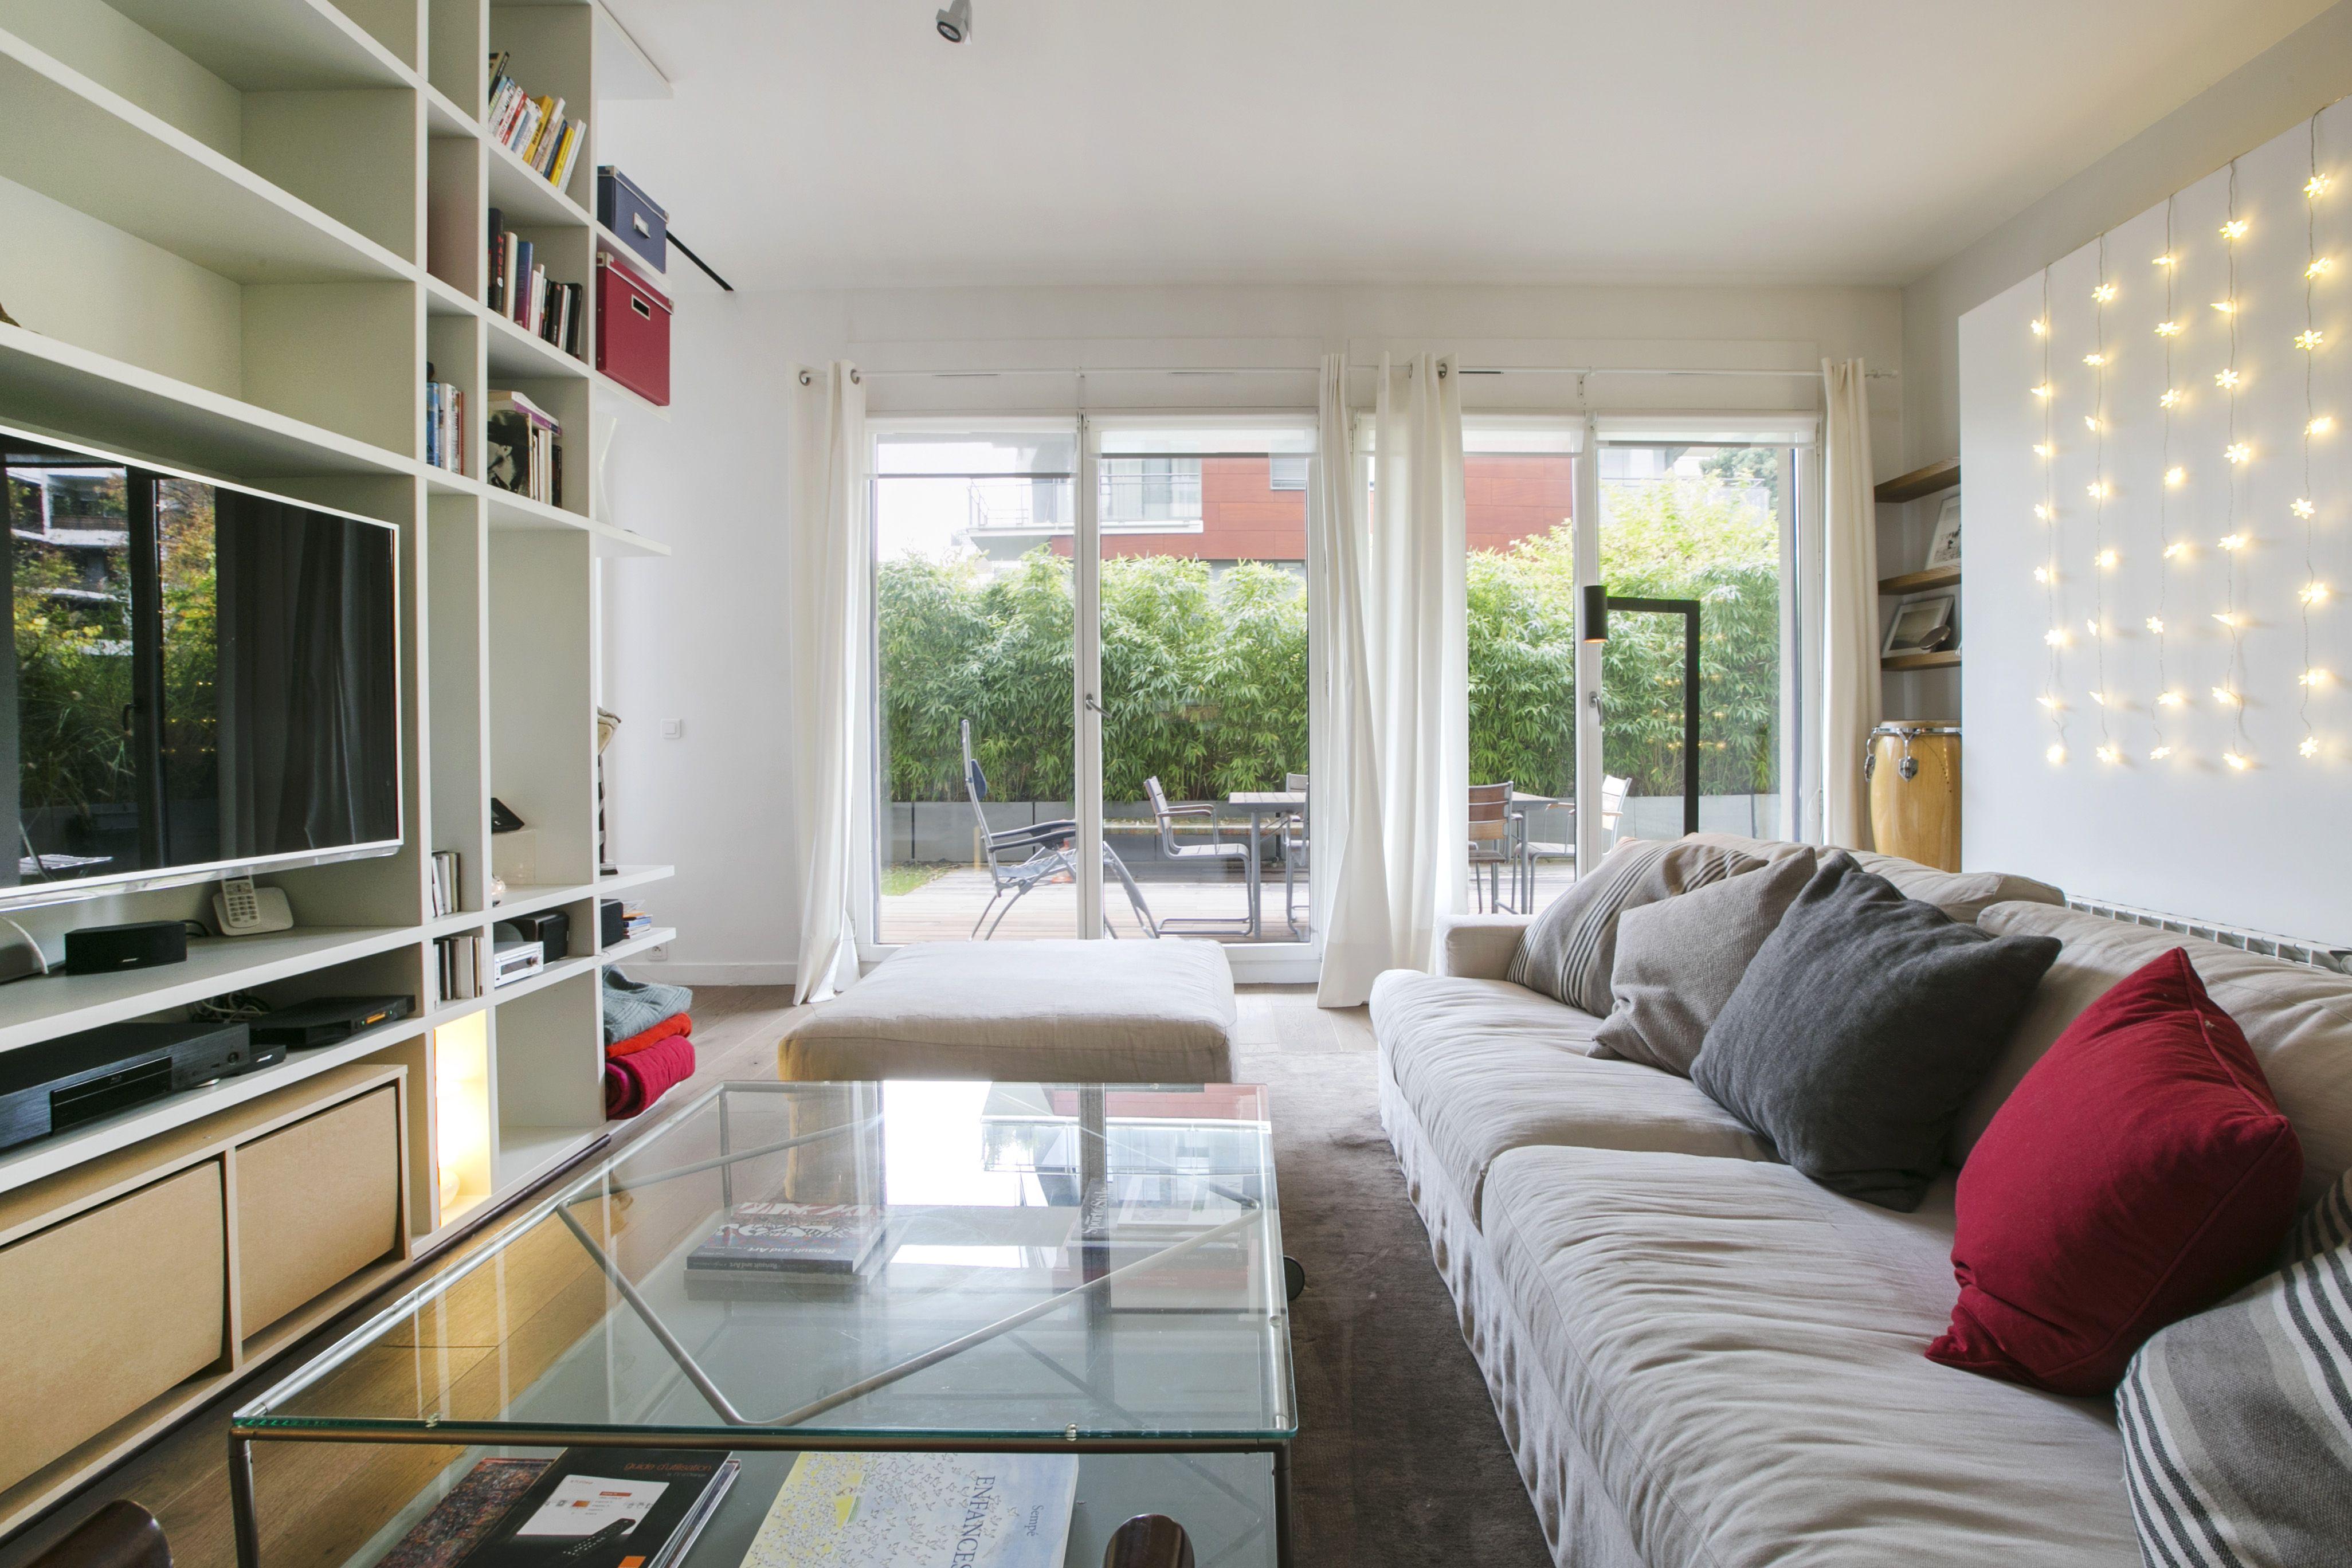 Appartement meubl d 39 environ 75m2 situ rue heyrault boulogne billancourt dans un immeuble - Meubles boulogne billancourt ...